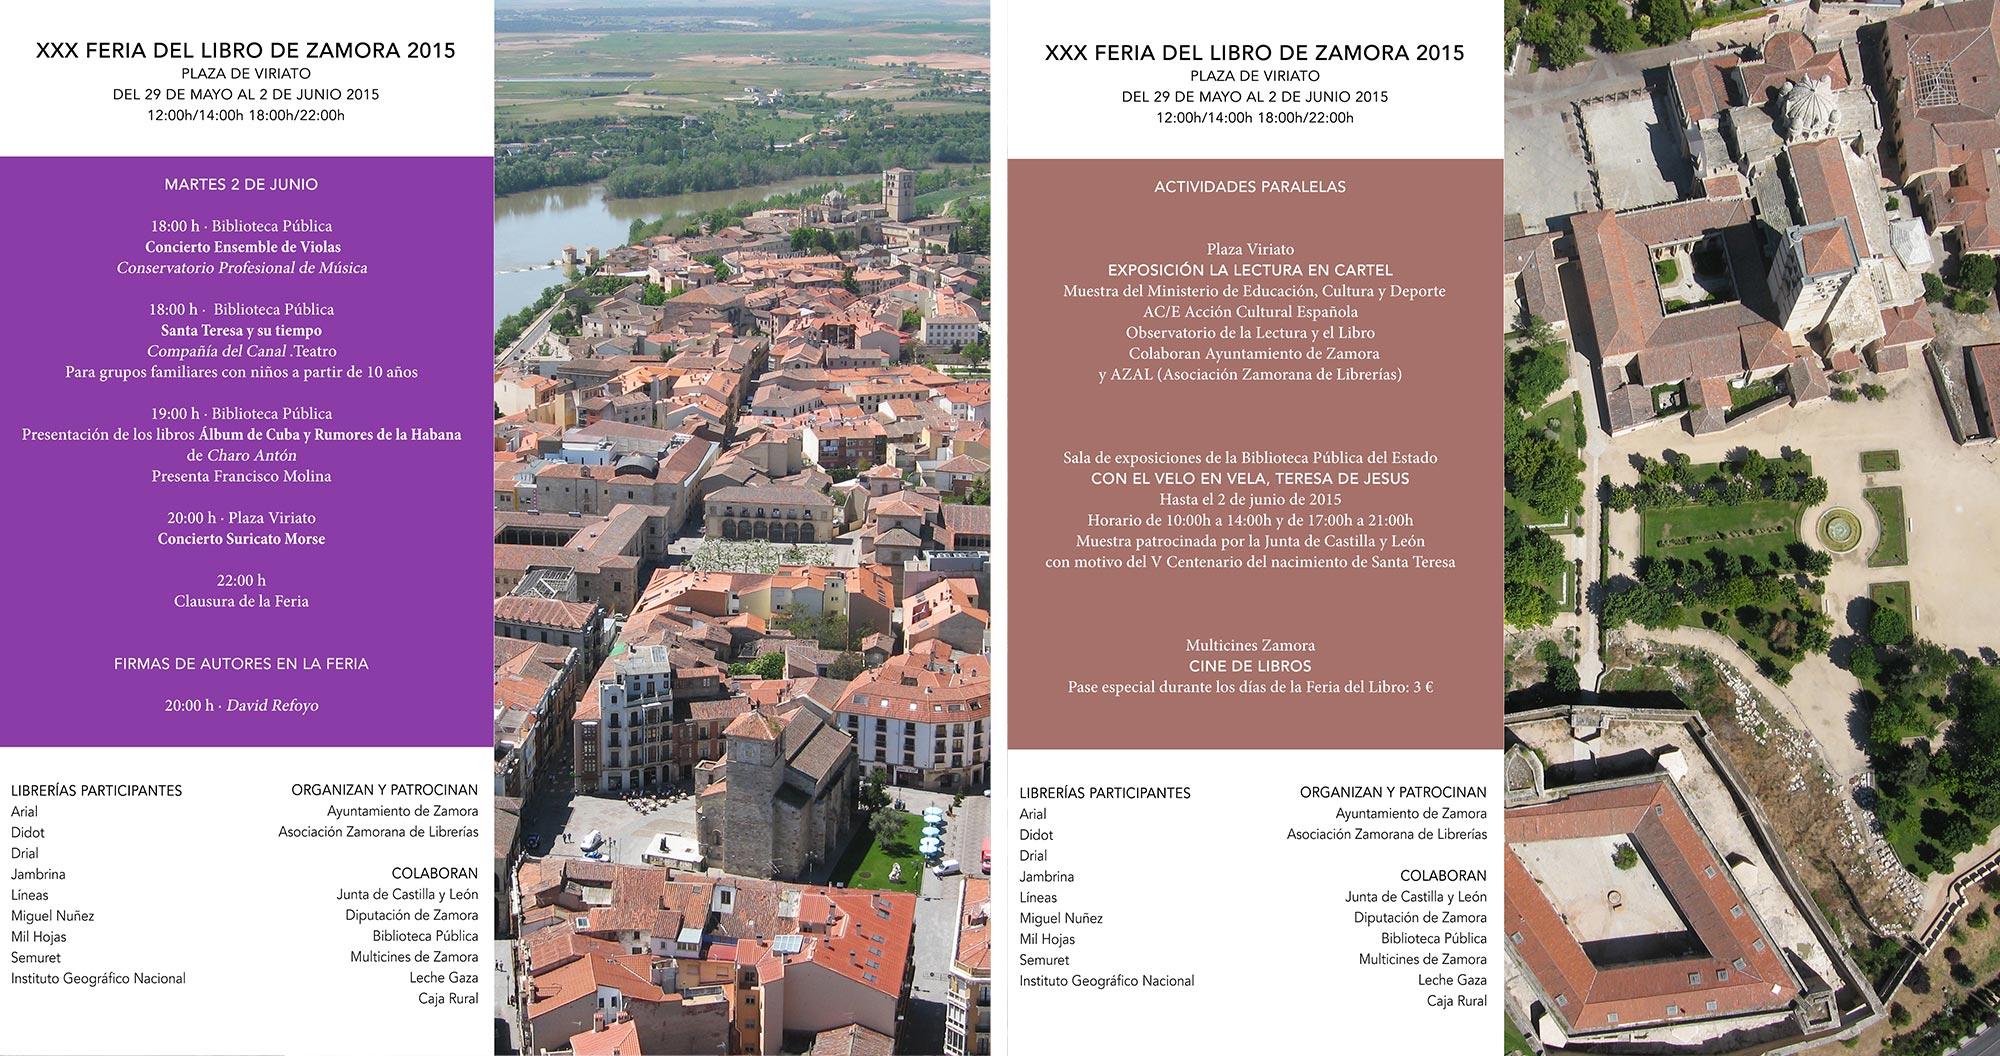 libreria-semuret-feria-del-libro-2015-zamora-cartel03